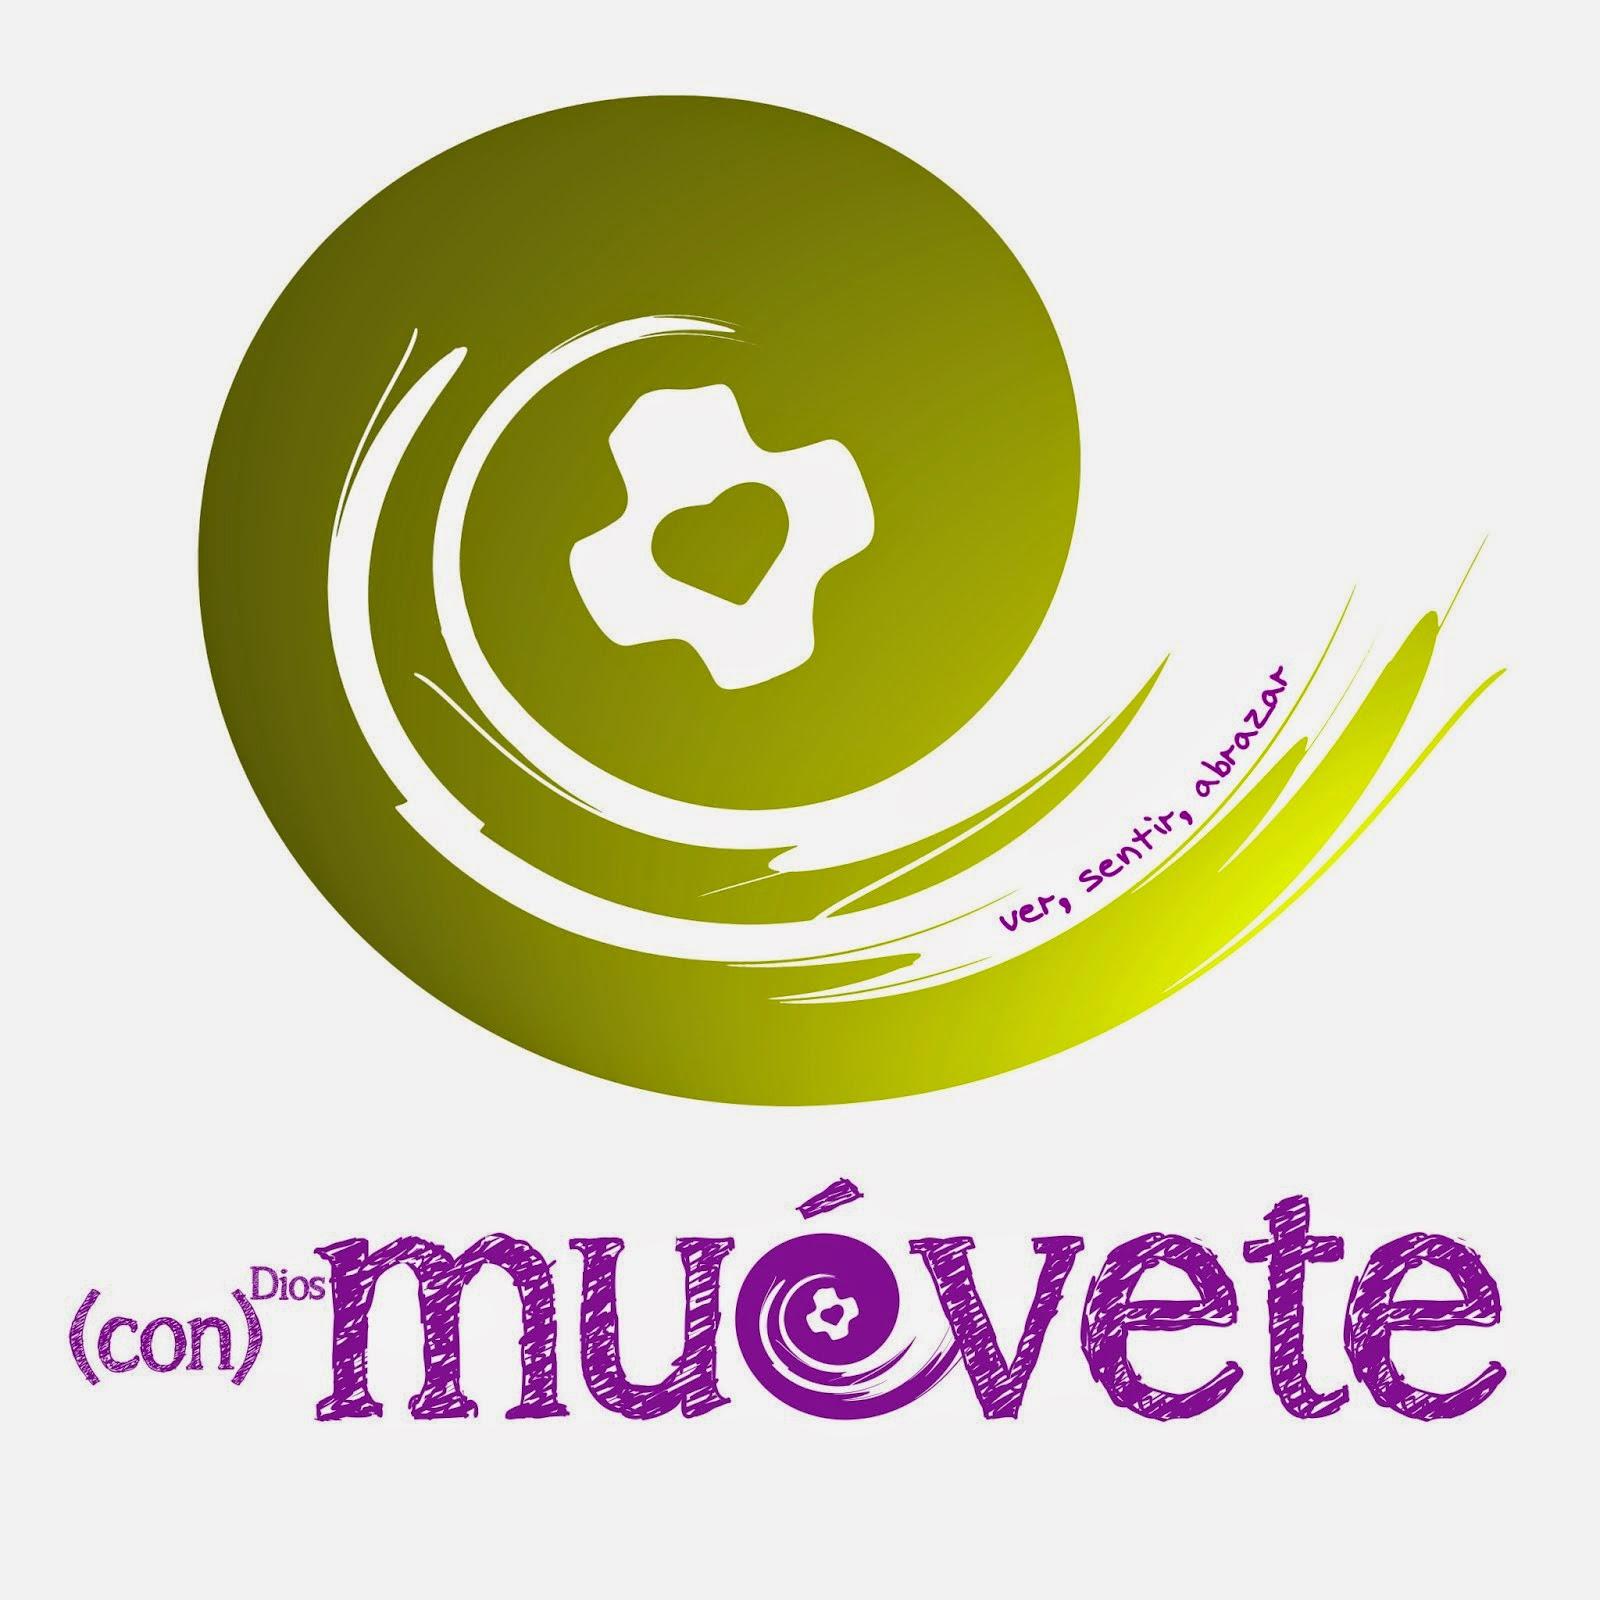 LEMA 2014-2015: ¡MUÉVETE!